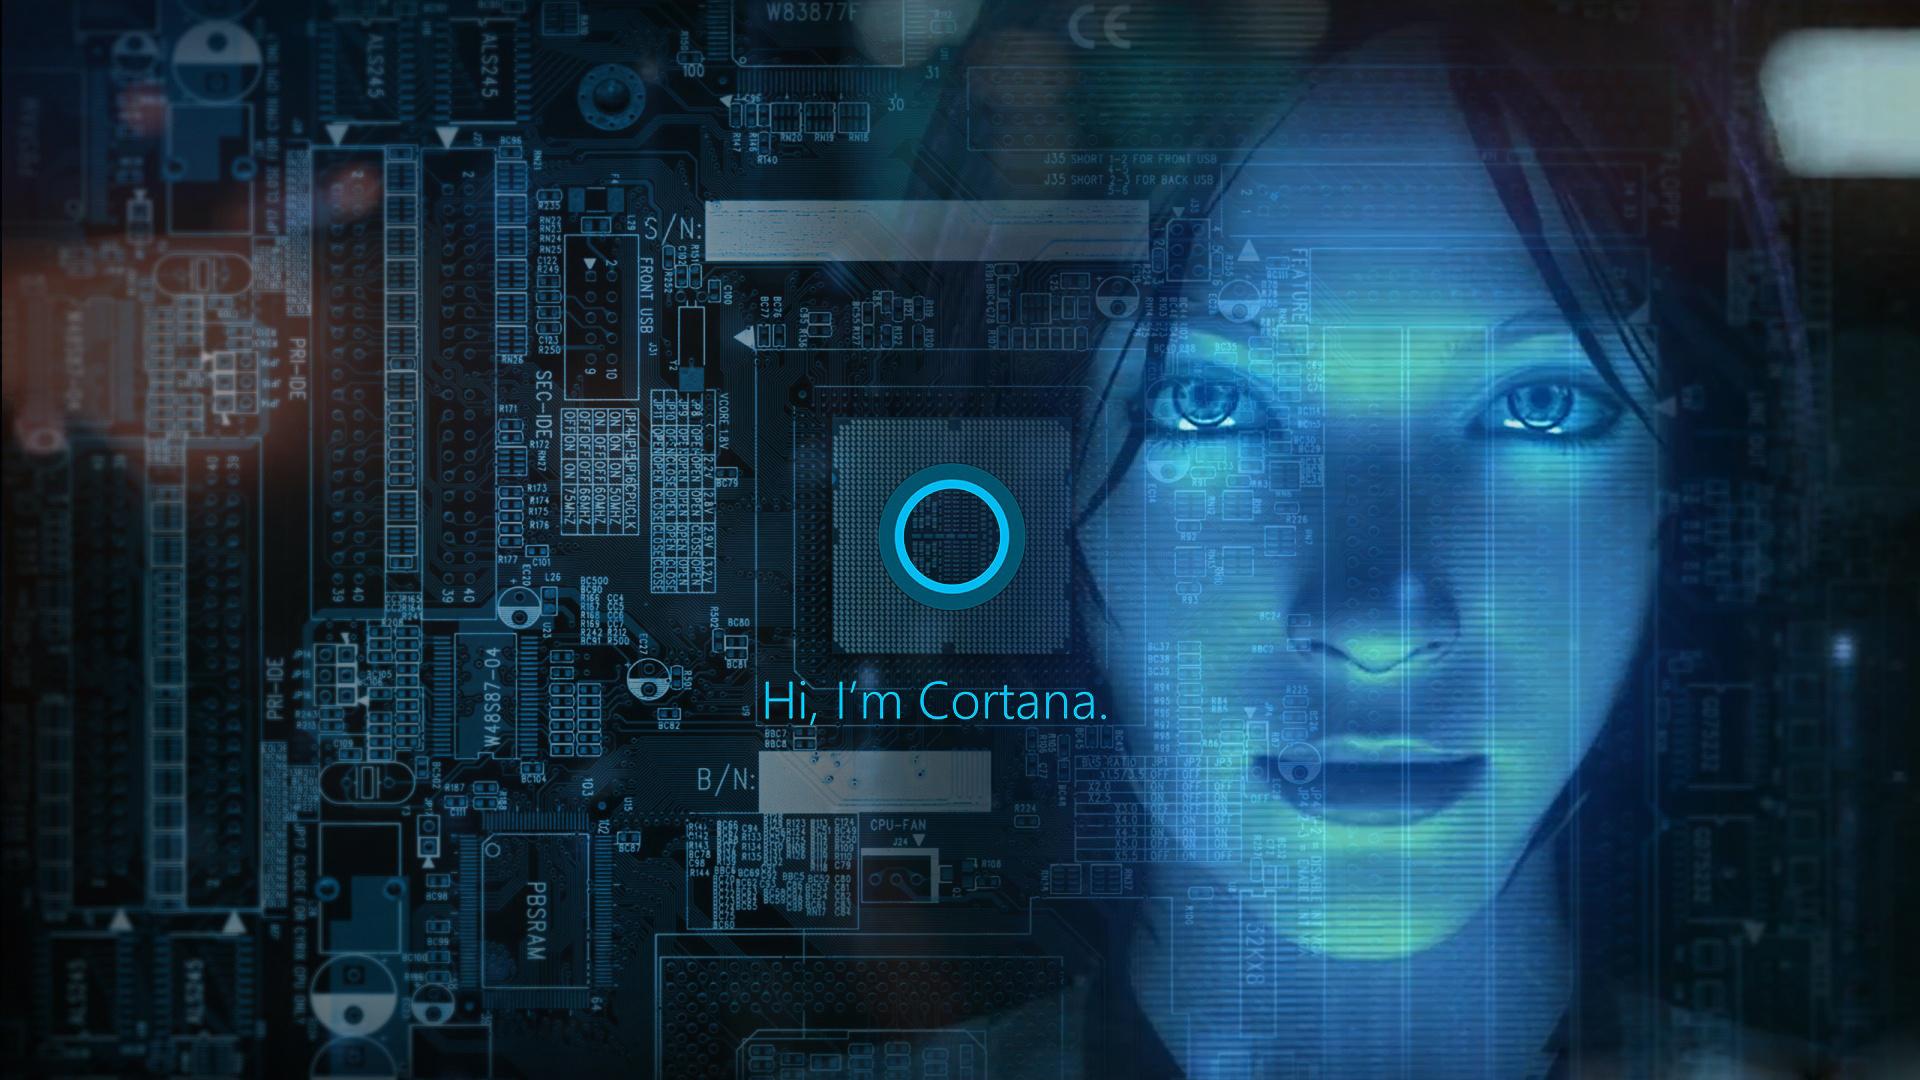 43] Microsoft Cortana Wallpaper on WallpaperSafari 1920x1080